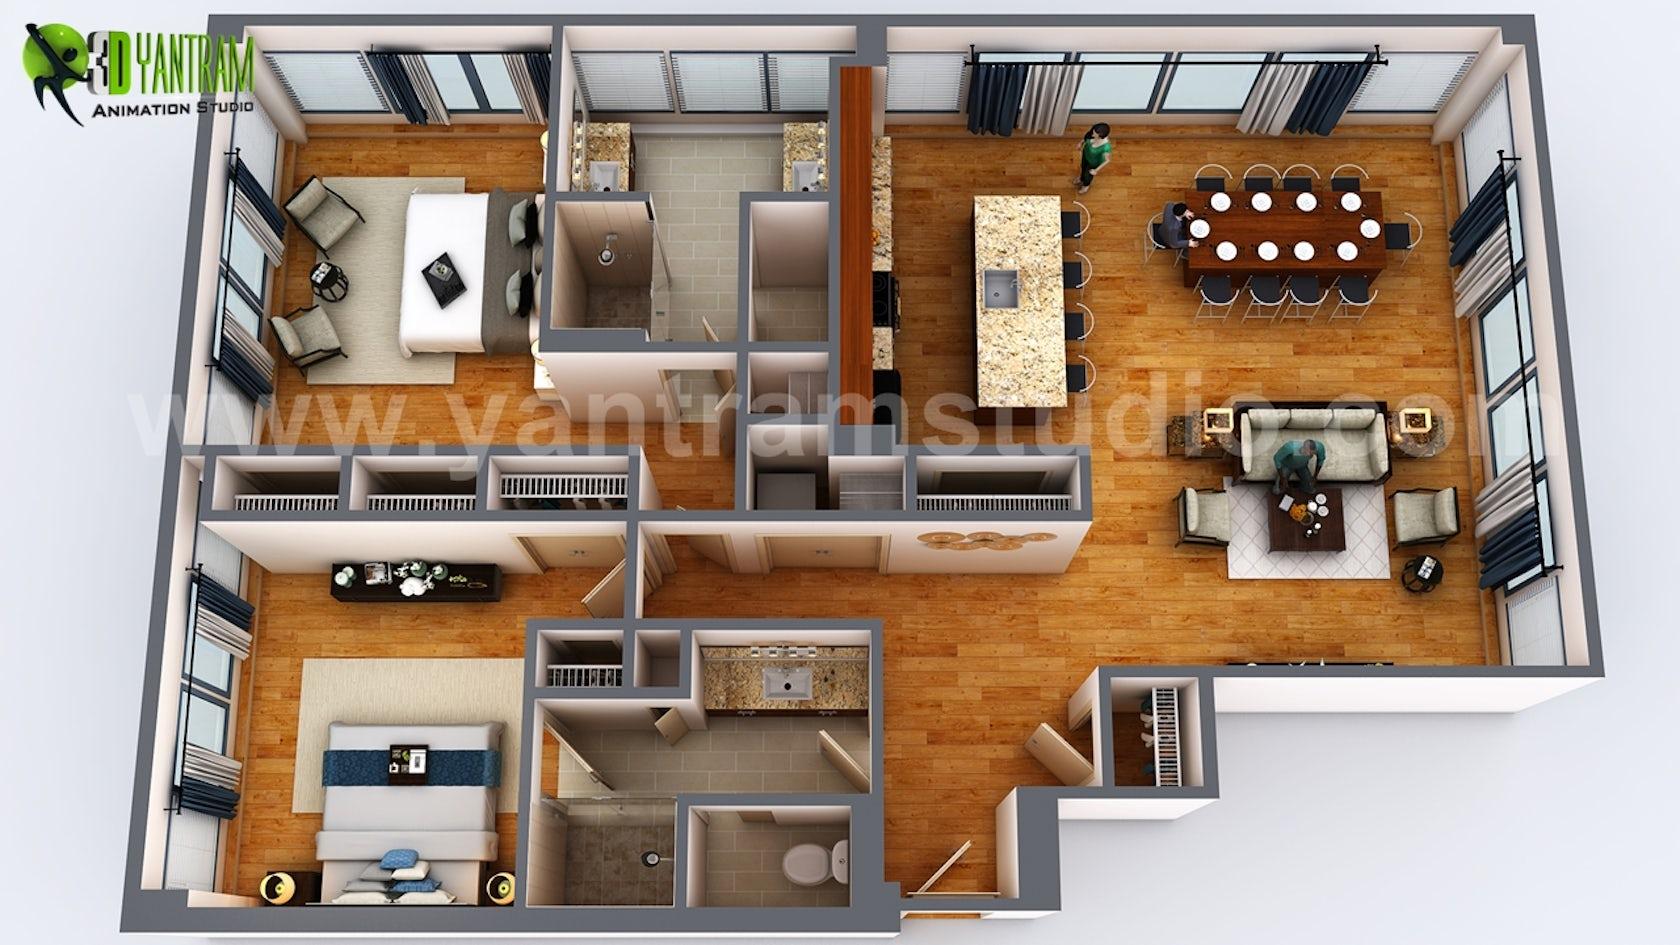 3d Floor Plan Rendering Apartment Design On Architizer